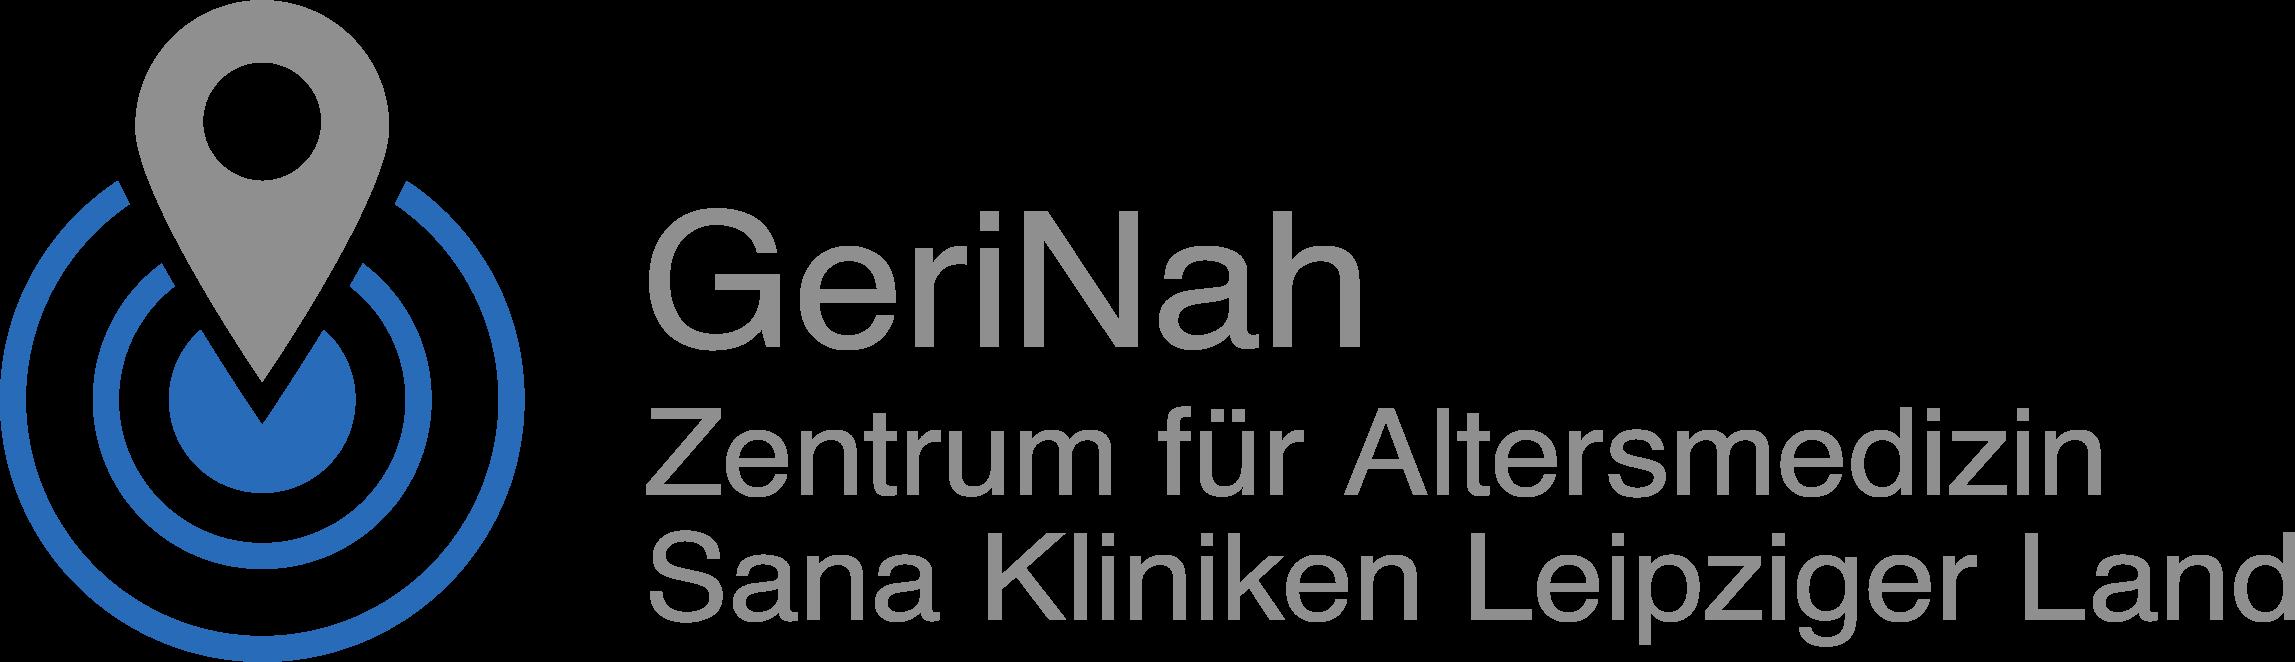 GeriNah Logo